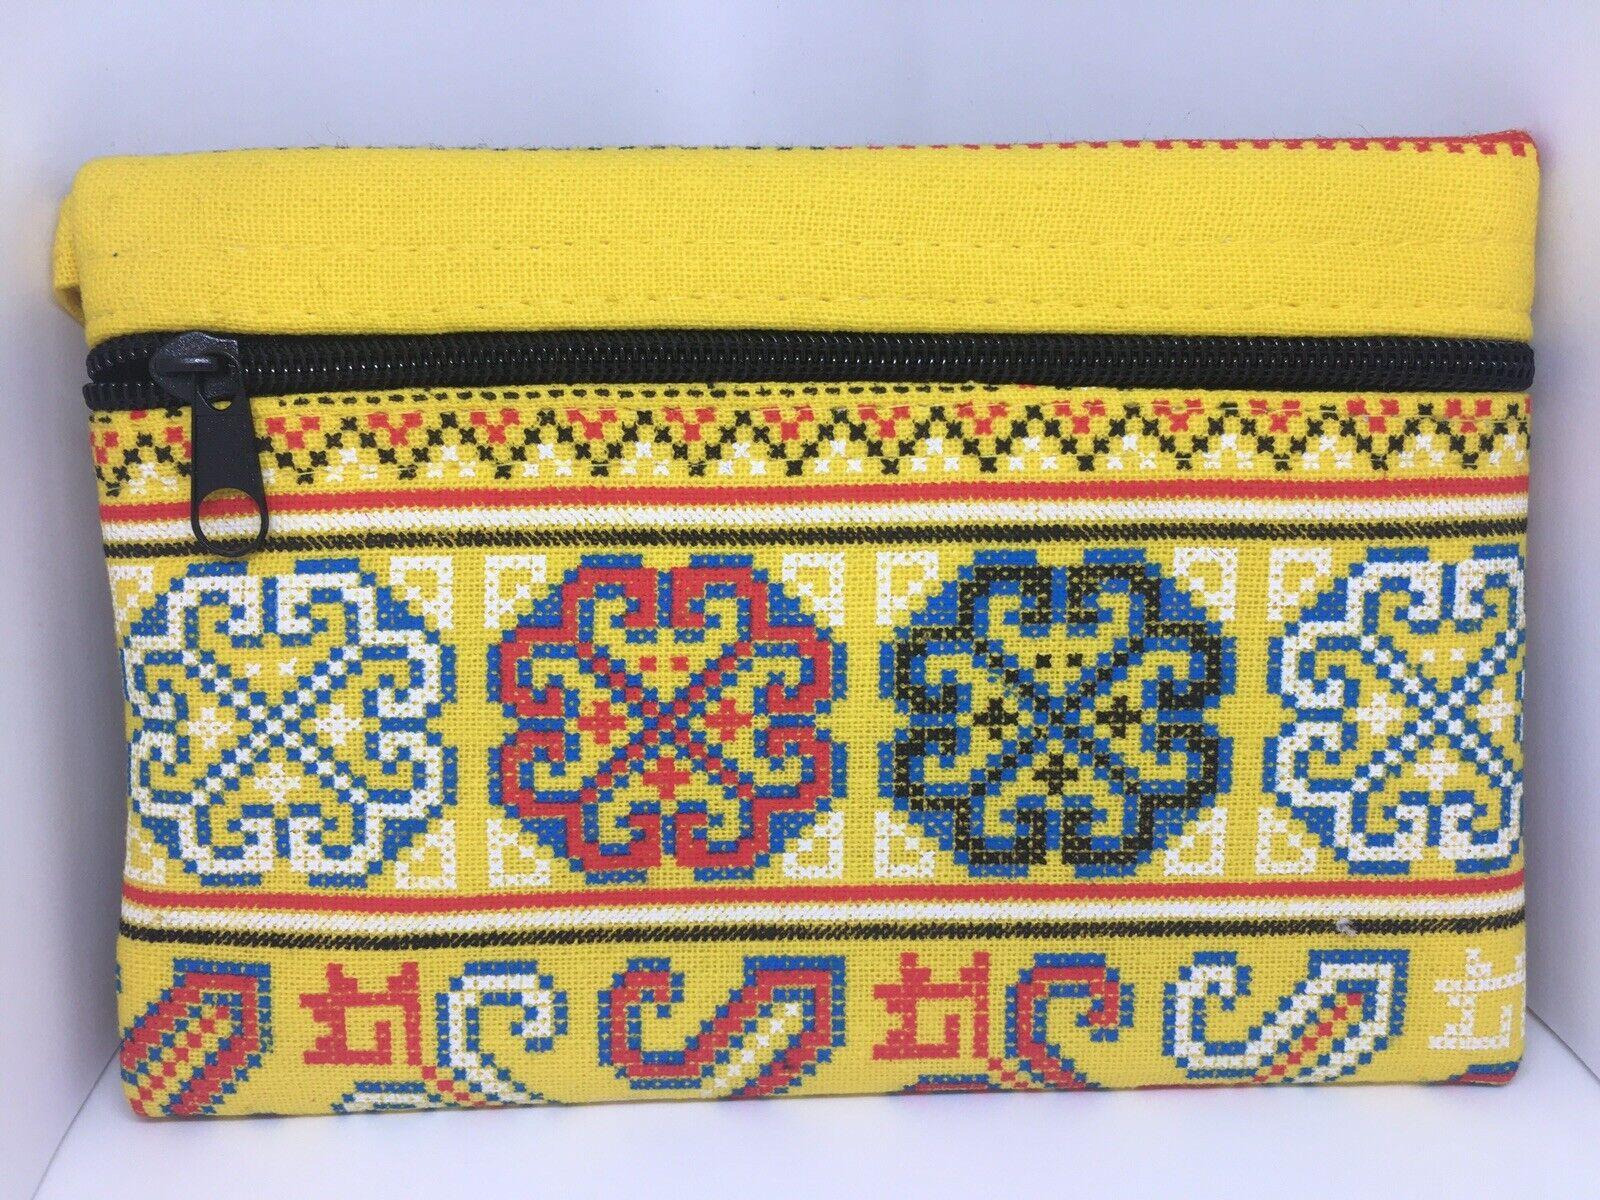 Beautiful Handmade Yellow Cosmetic, Card, Coin Bag, Purse Aprox 18x13cm